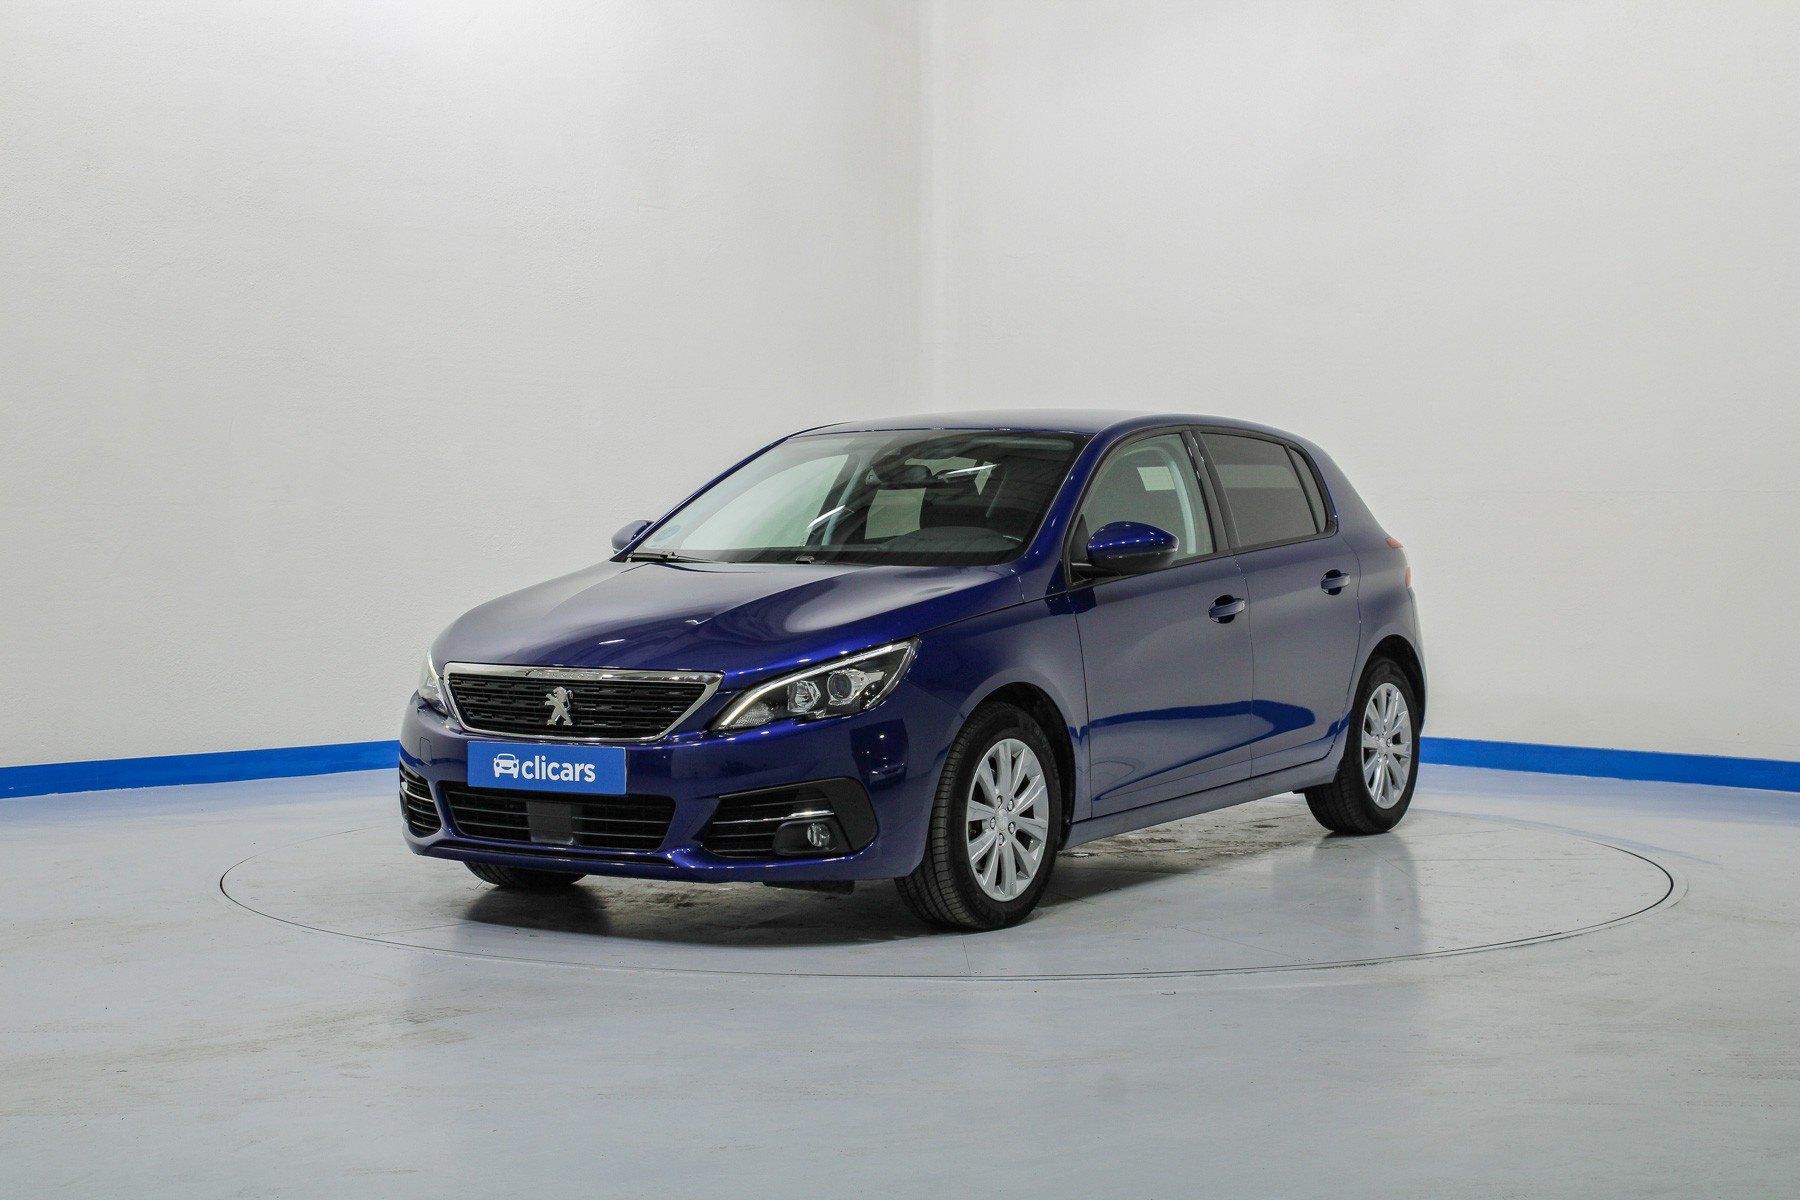 Peugeot 308 Diésel 5p Style 1.5 BlueHDi 96KW (130CV) 1